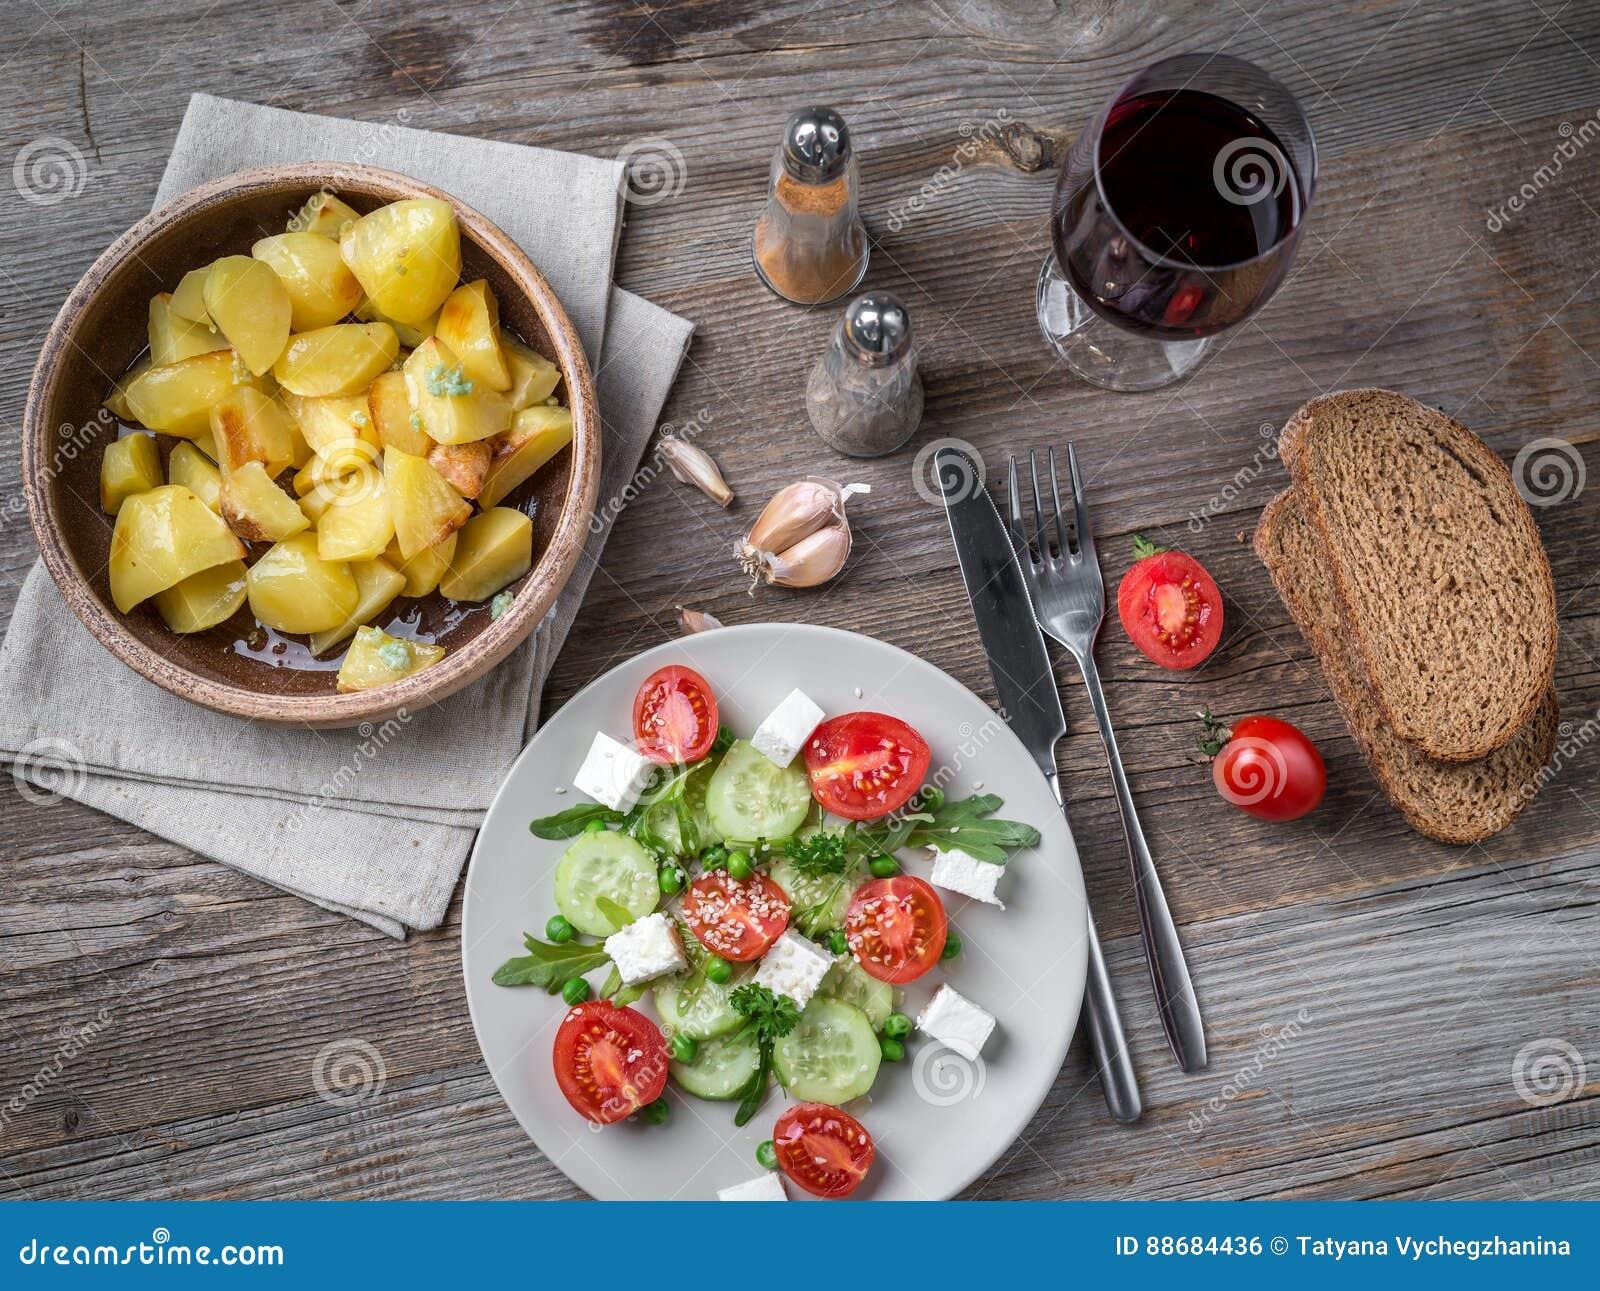 Греческий салат из картошки